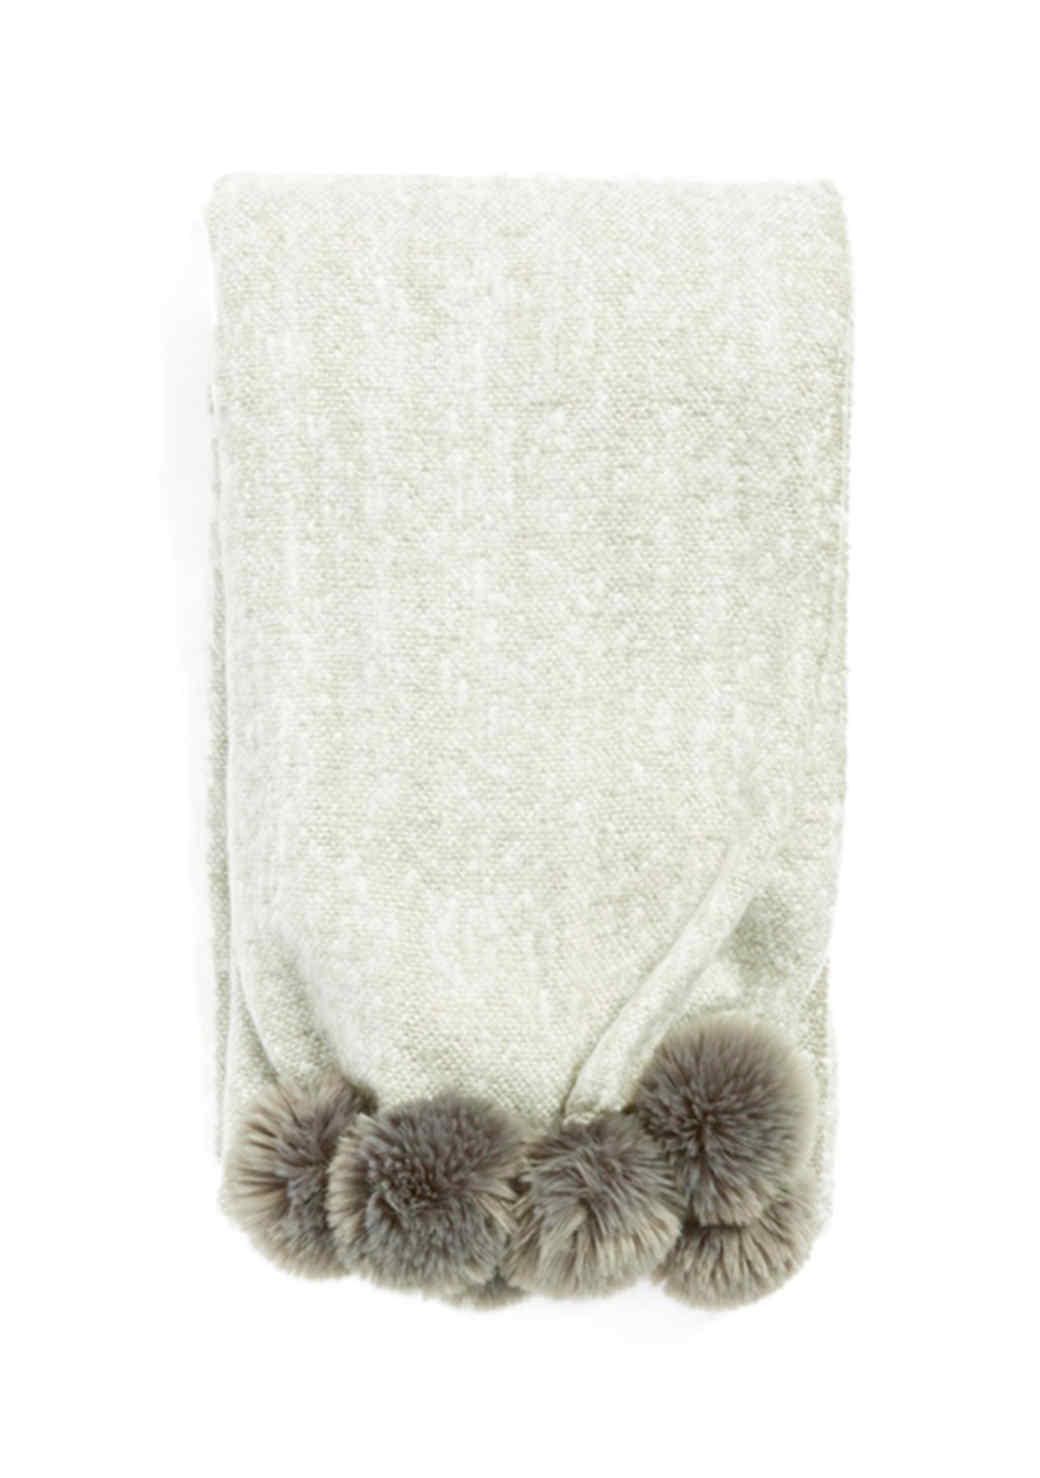 pompom-throw-blanket-1015.jpg (skyword:196064)